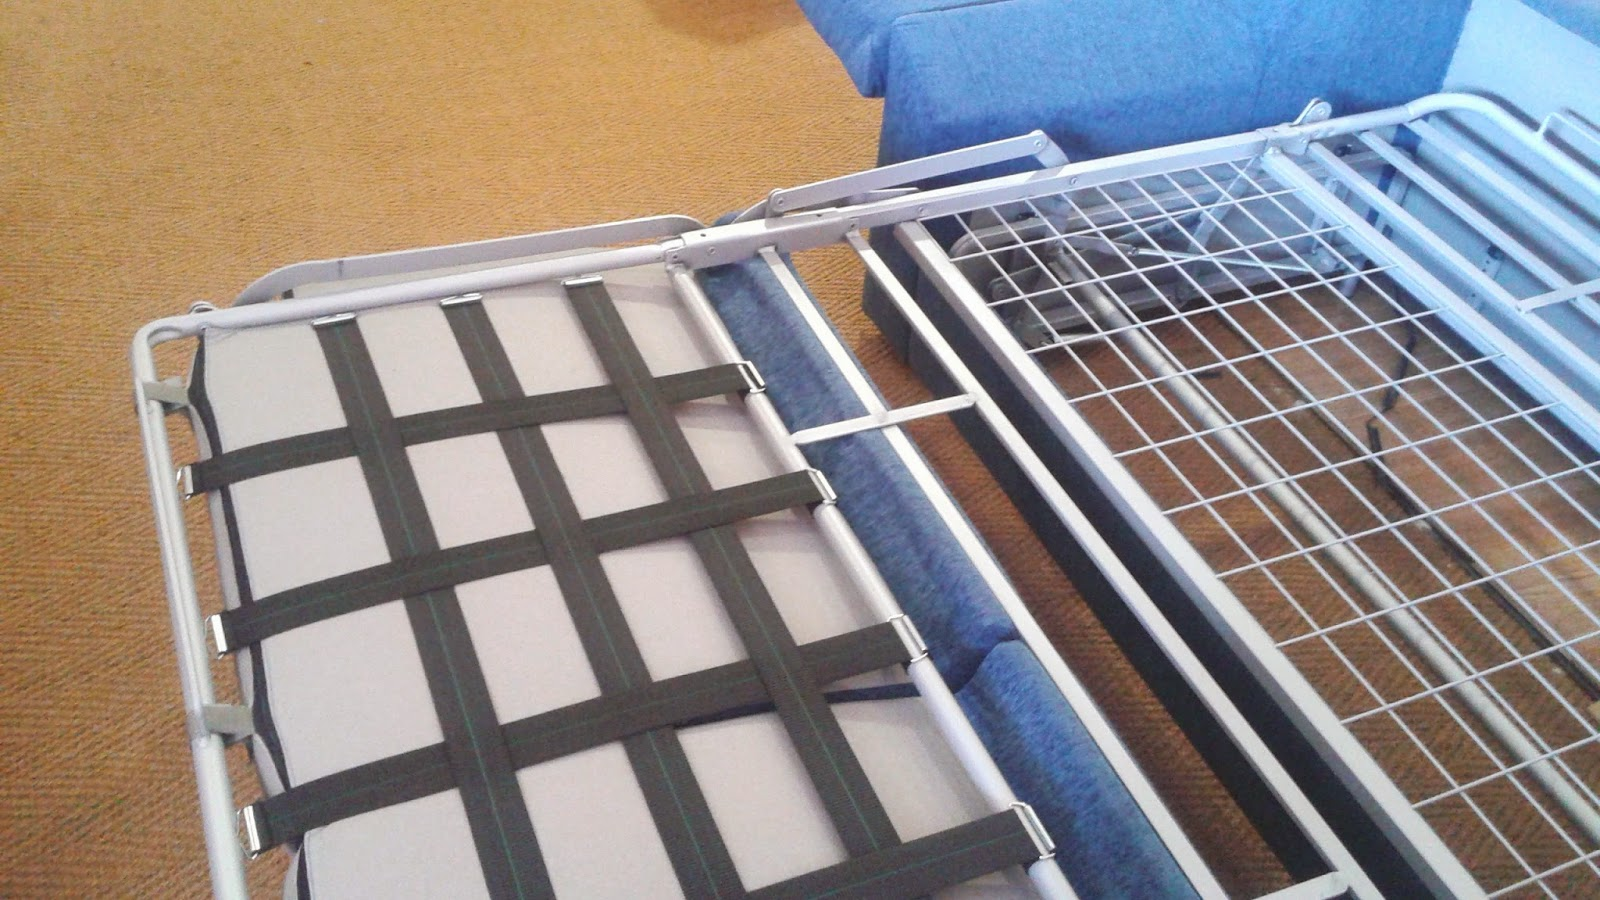 Sof s cama el mecanismo italiano tkautiva for Colchon para sofa cama libro